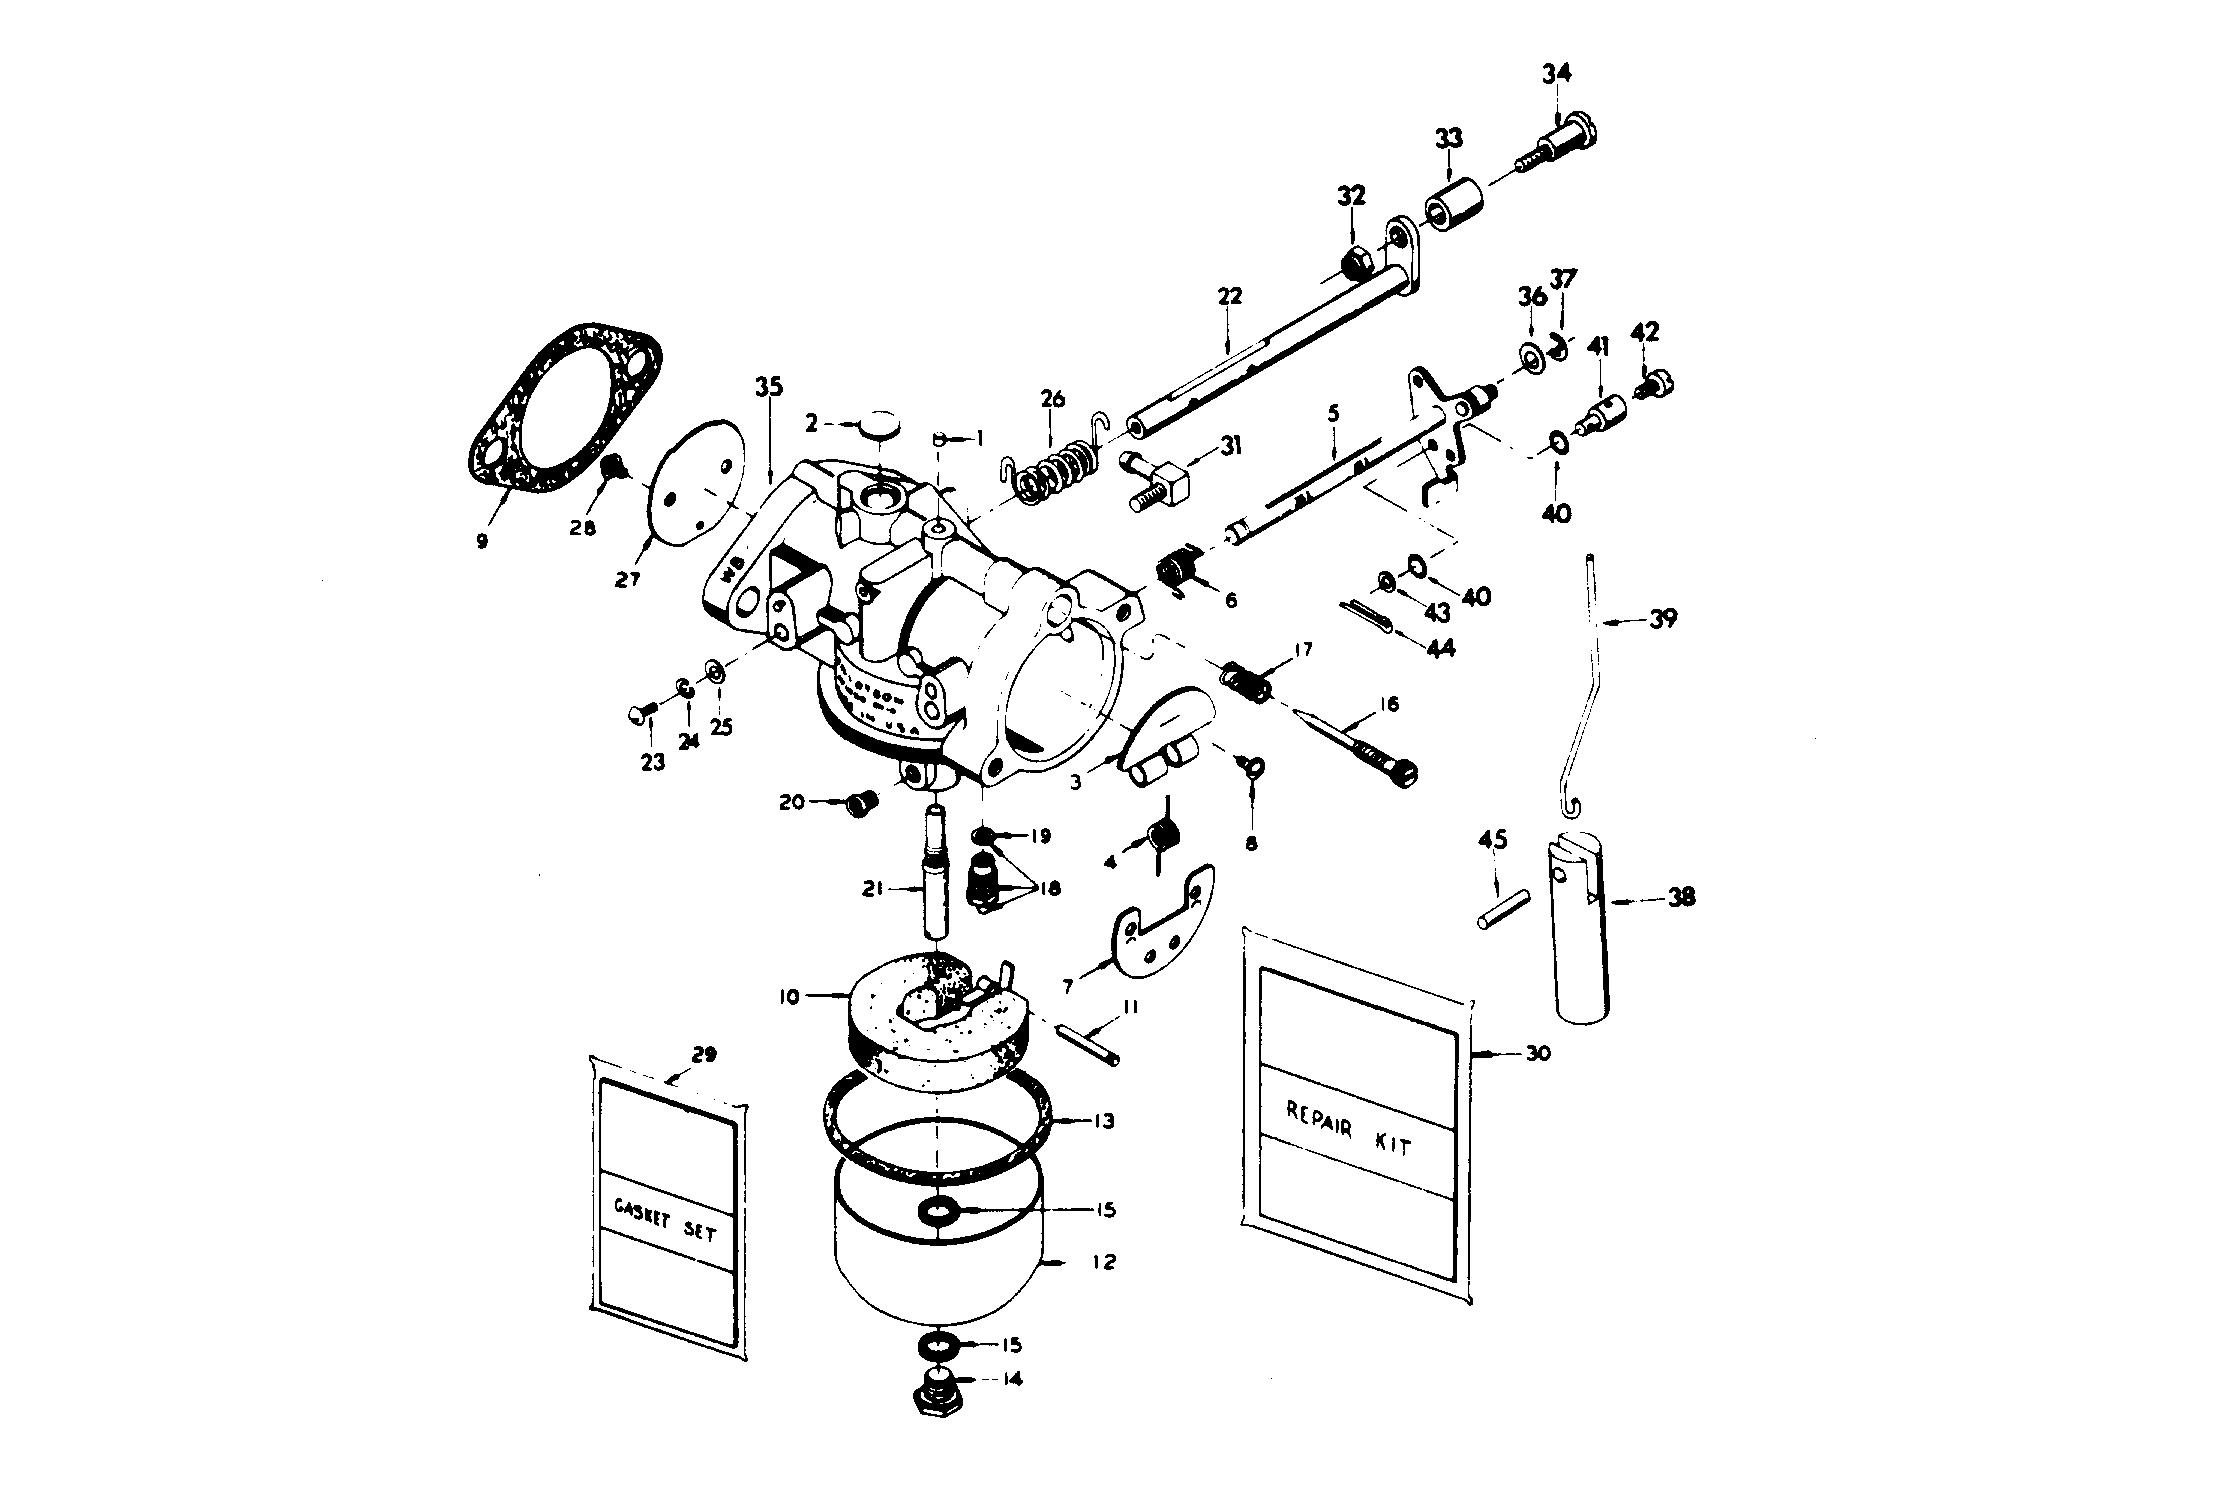 1981 mercury 90 outboard diagram